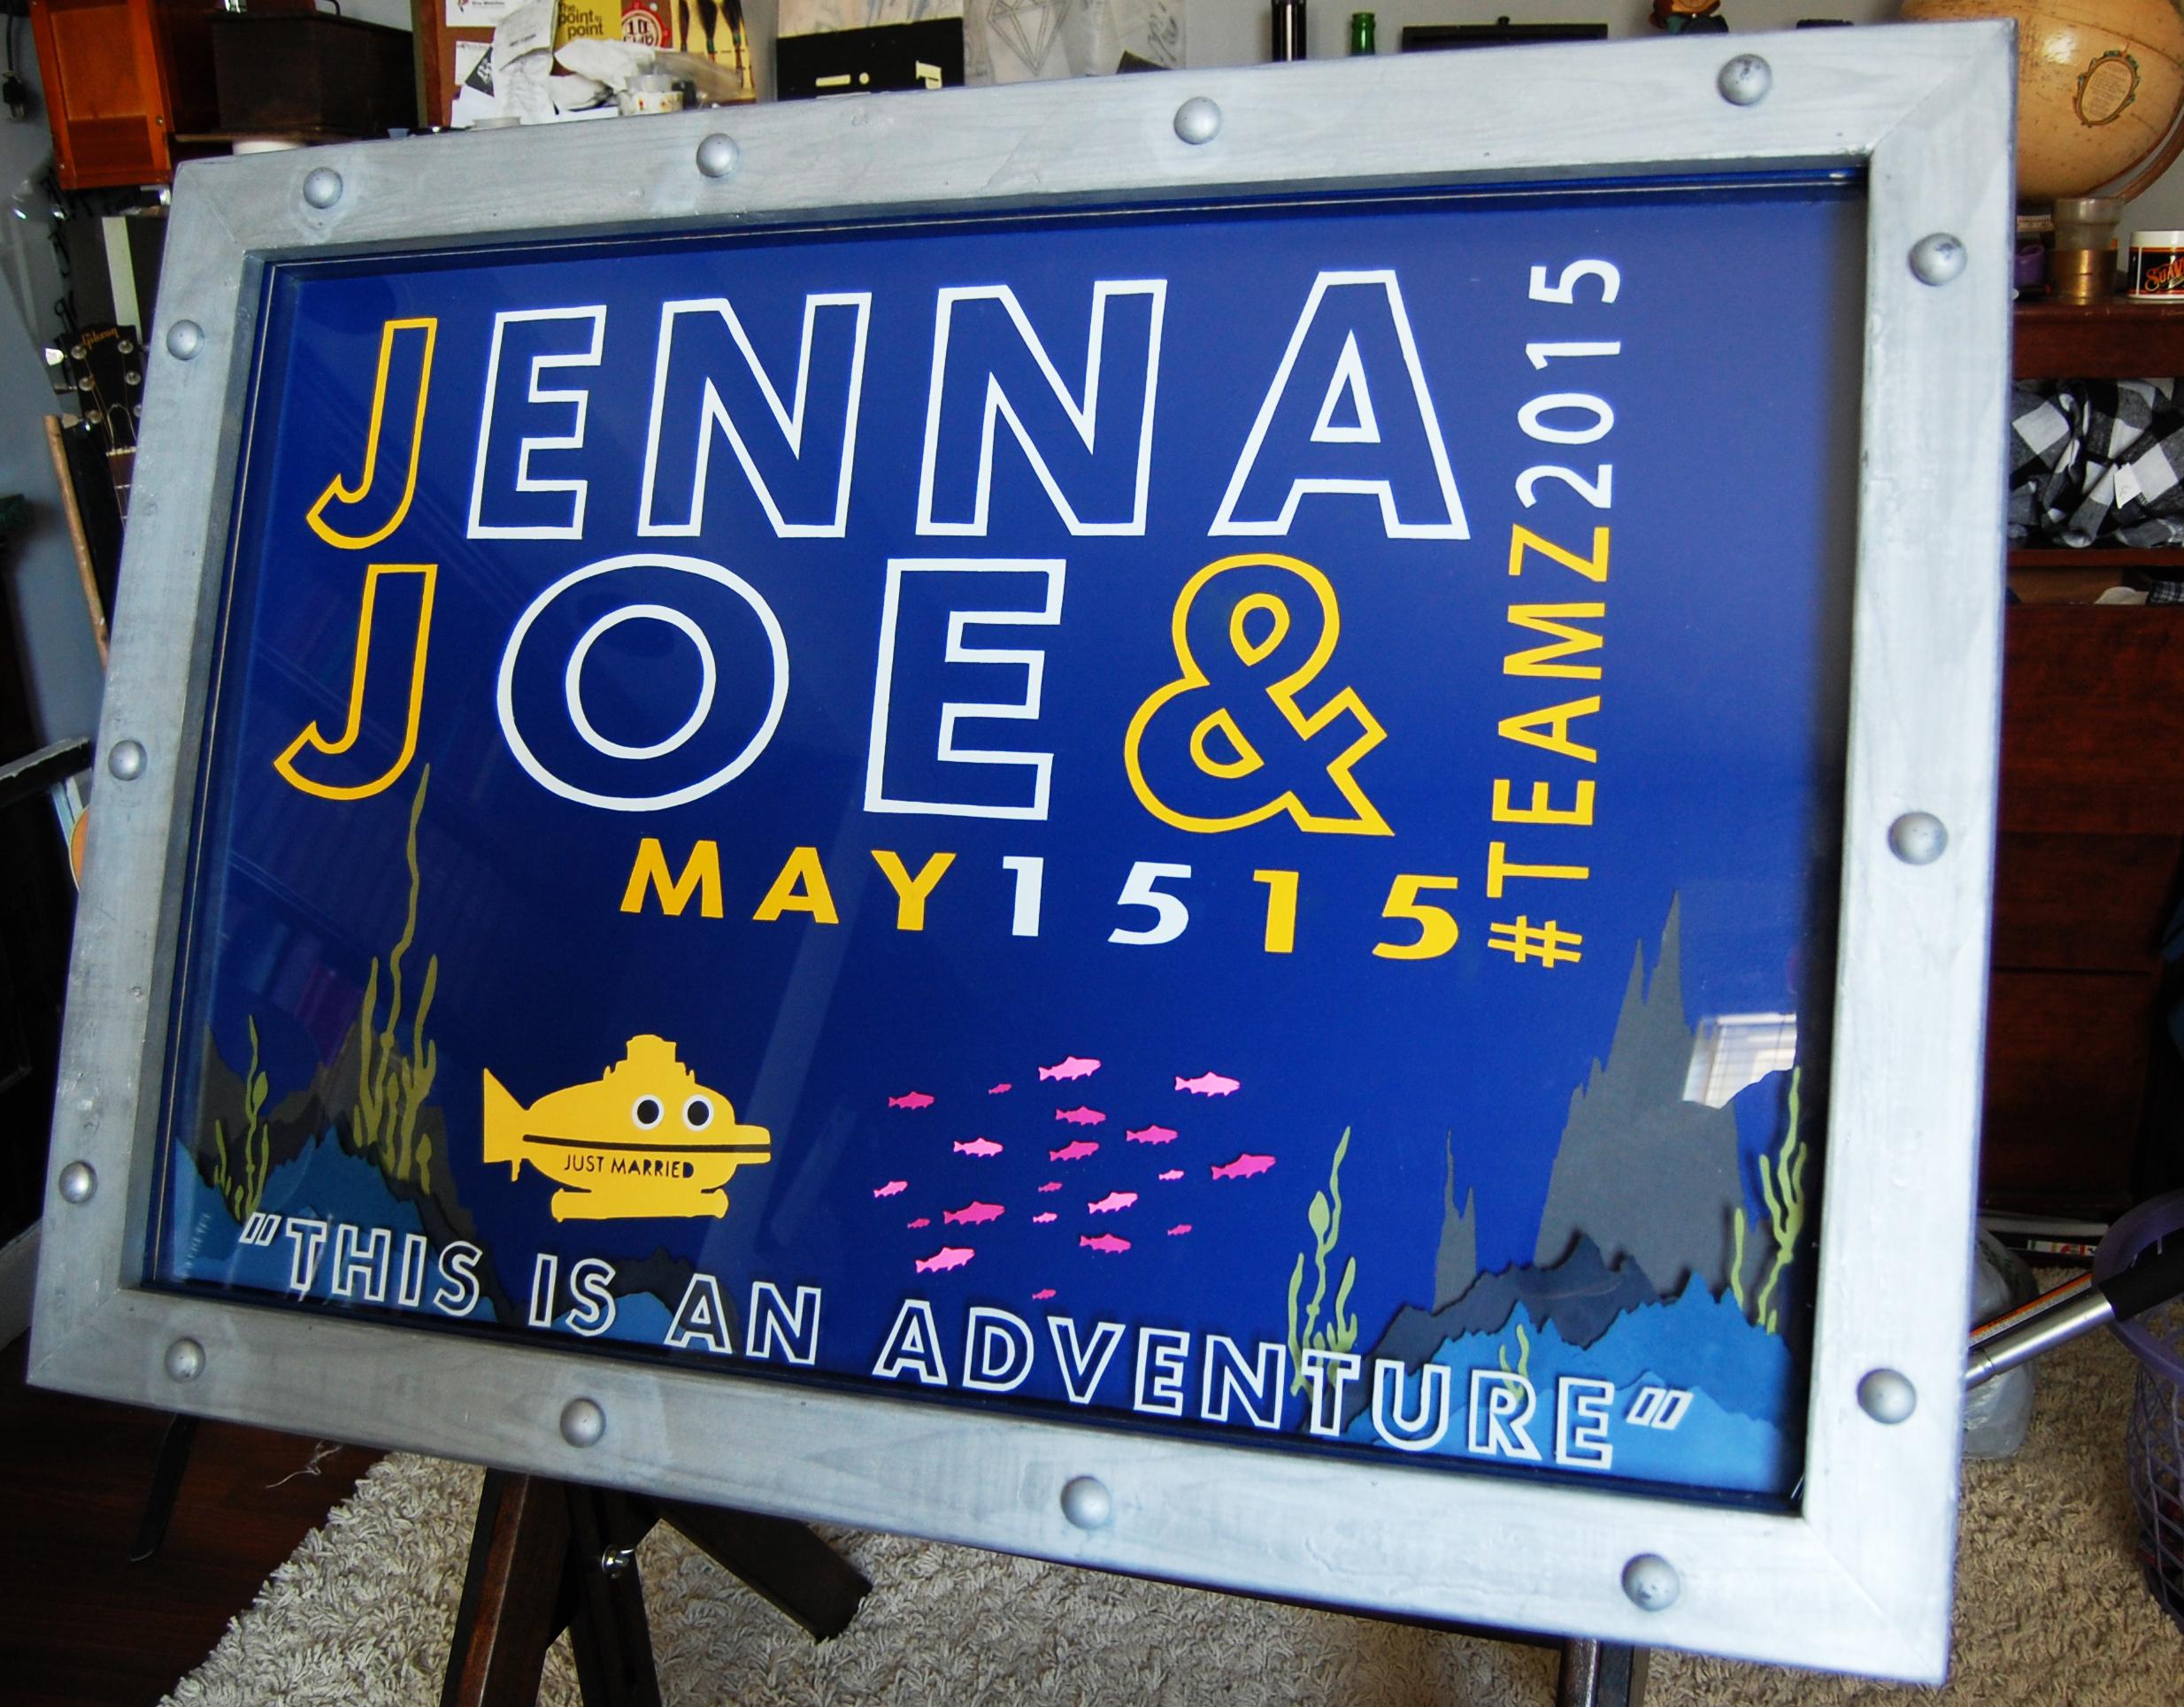 Jenna & Joe